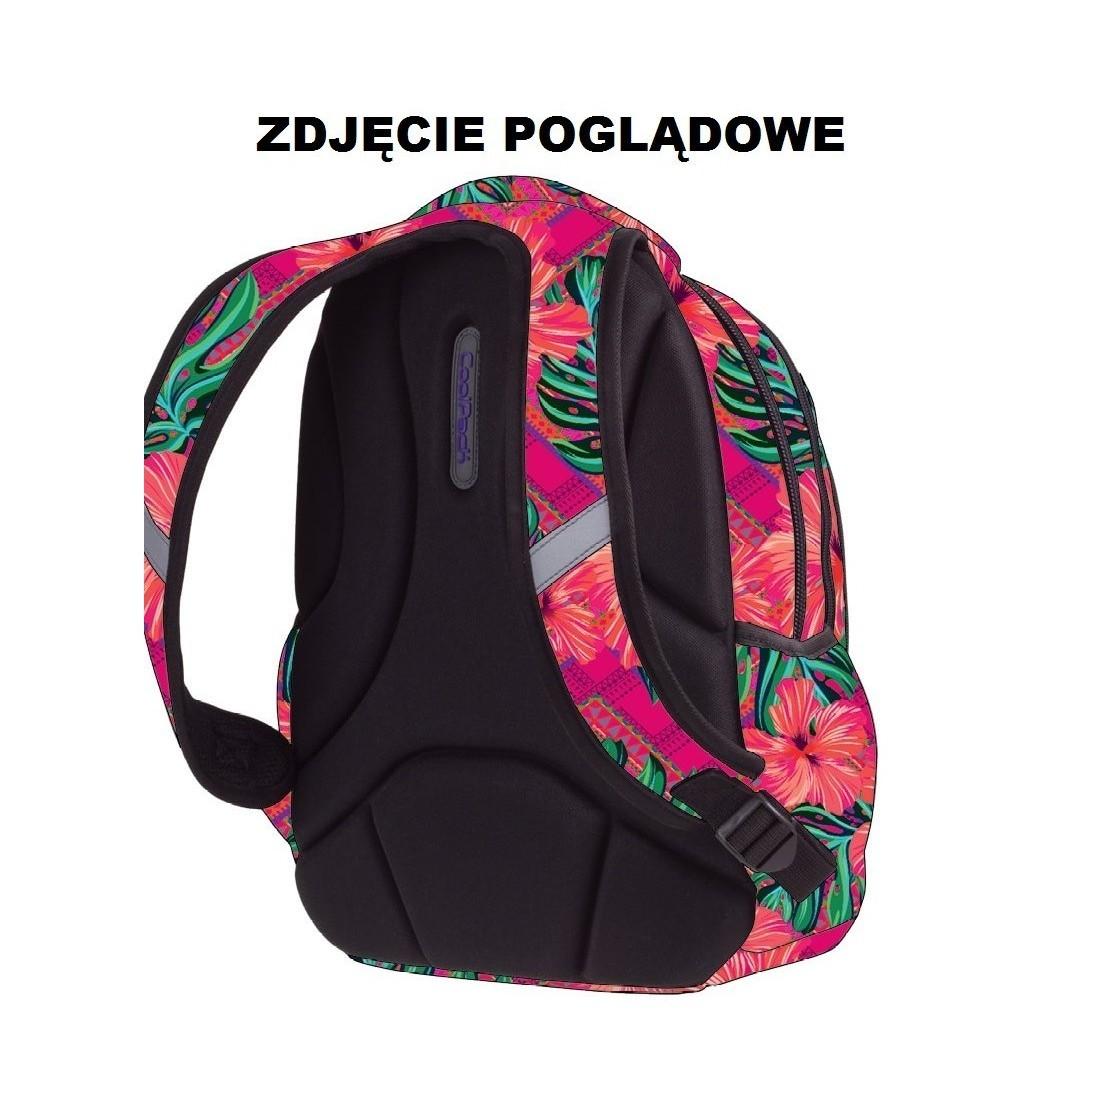 55a6e17baa217 ... cooler bag - 1061  CoolPack CP PRIME BOHO ELECTRA Aztec Boho plecak dla  pierwszoklasisty azteckie wzory - 1061